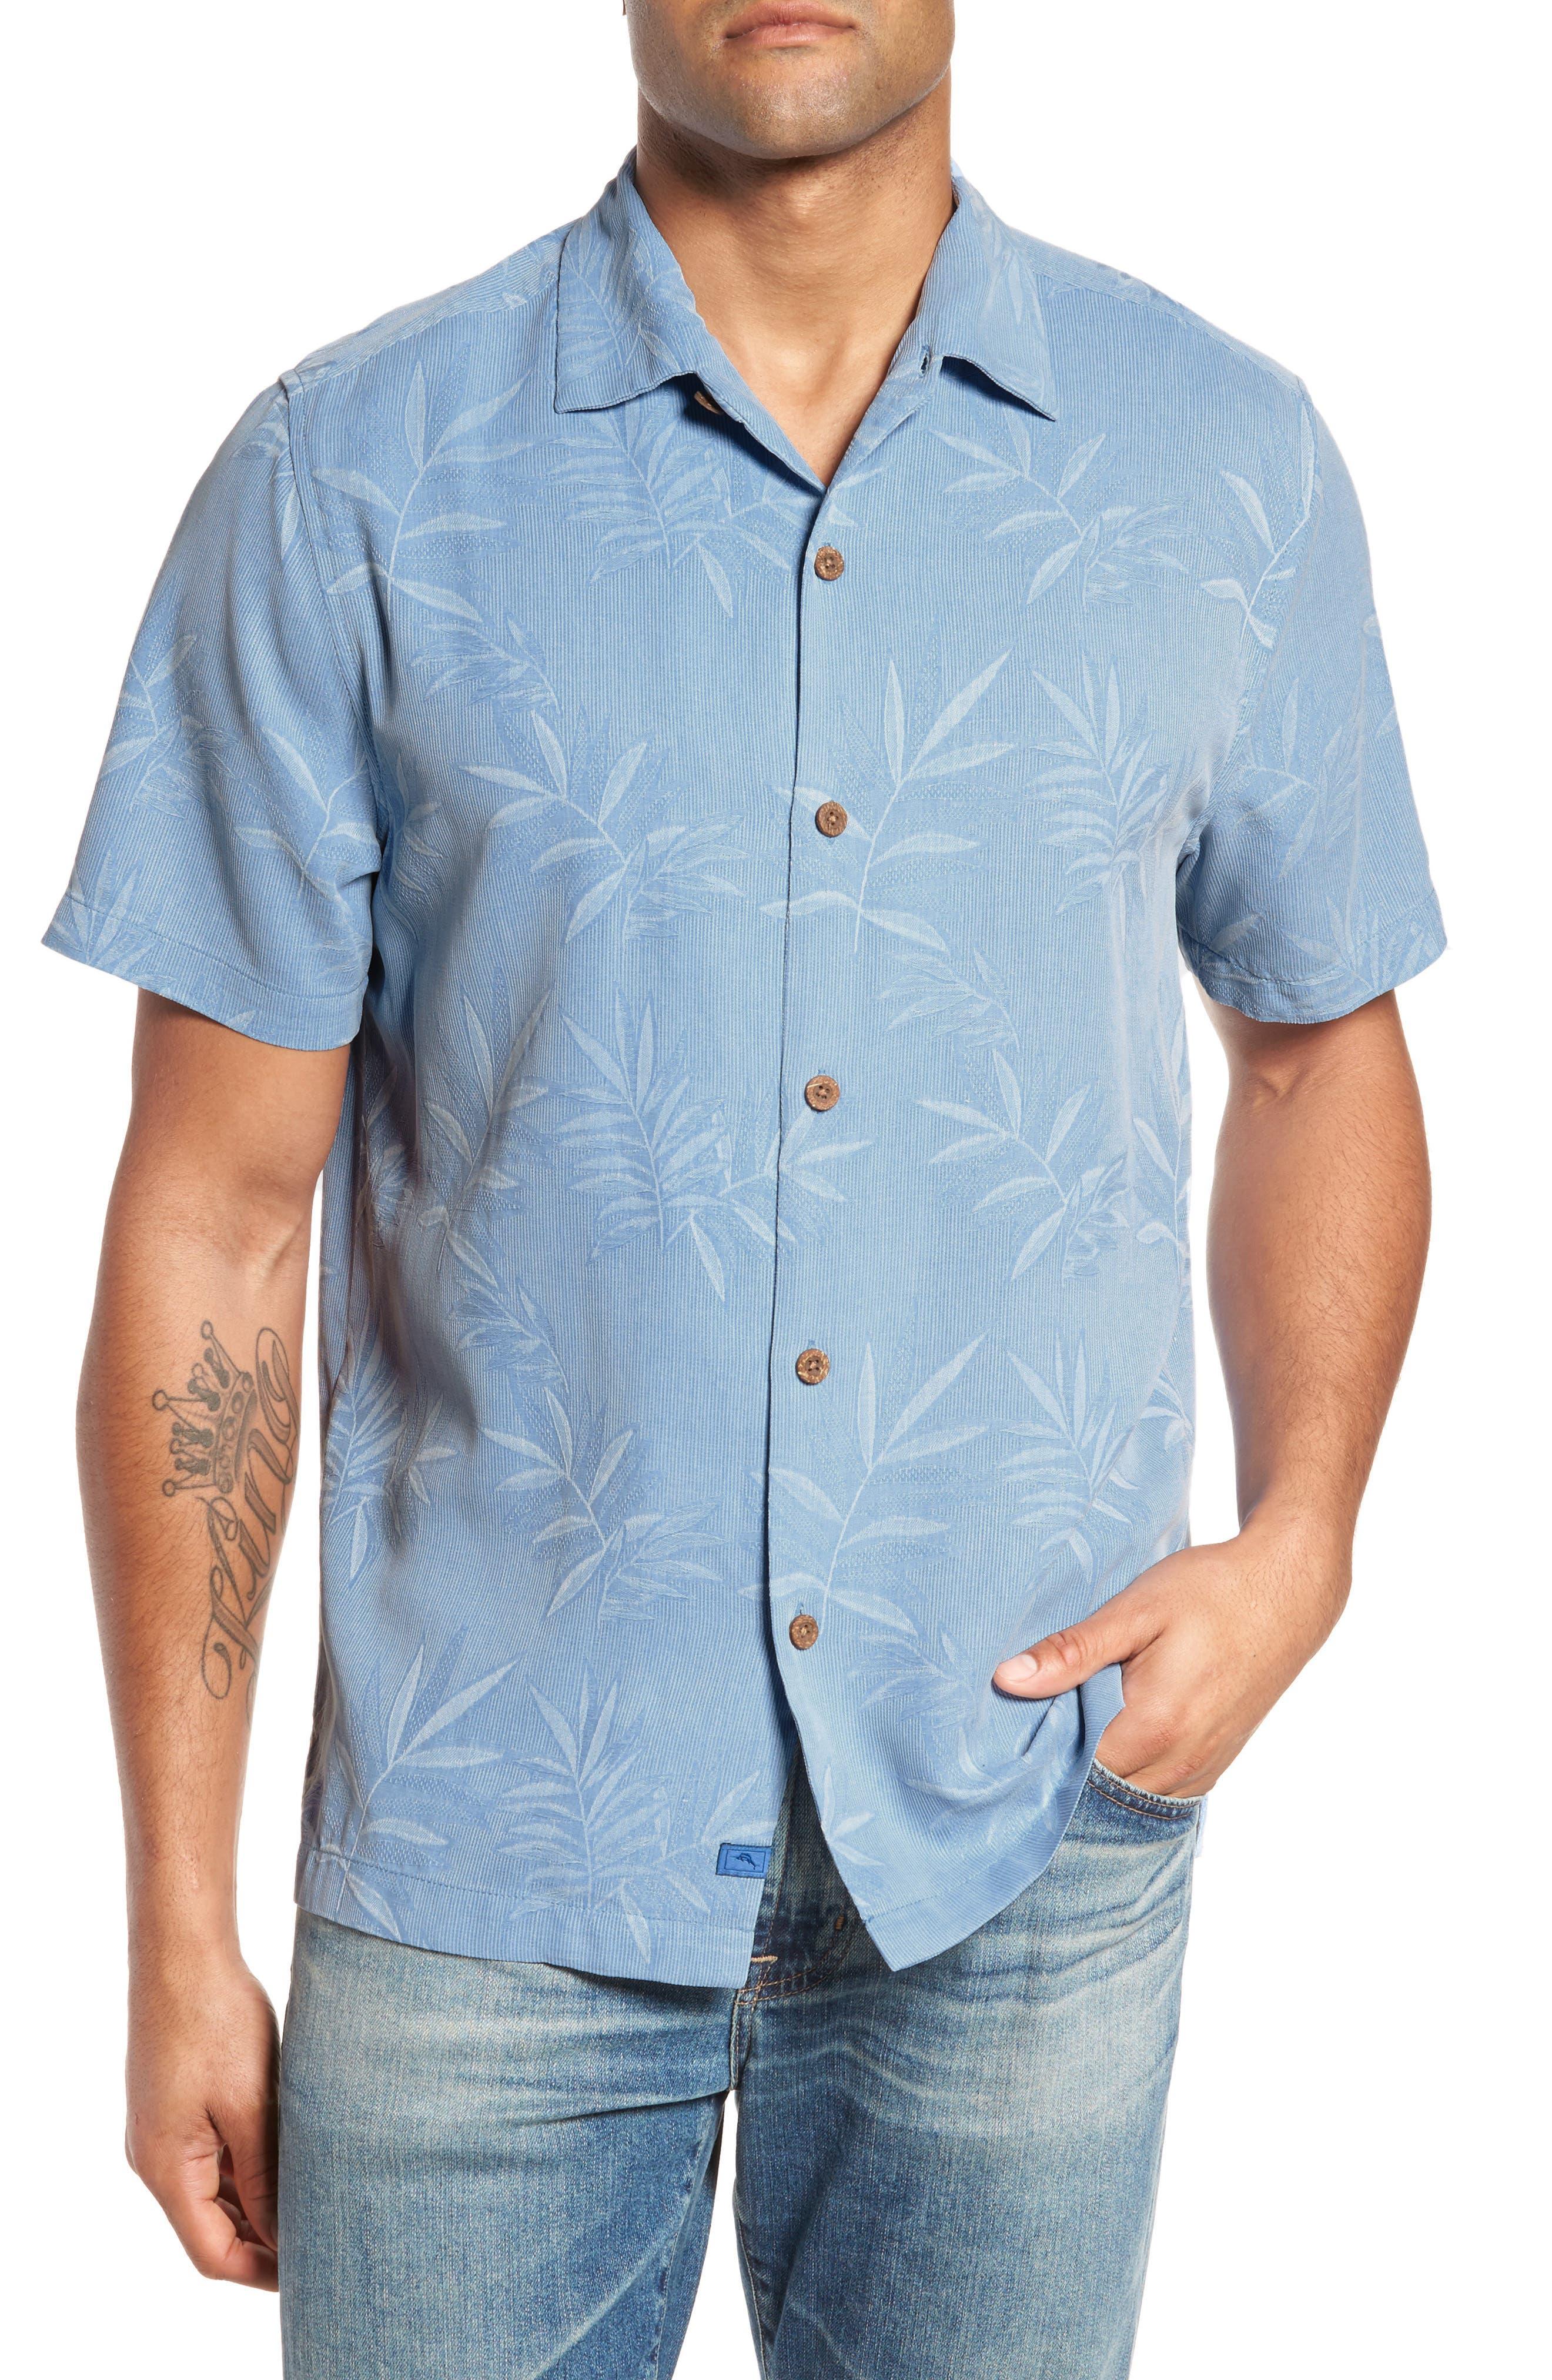 TOMMY BAHAMA Luau Floral Silk Shirt, Main, color, 408